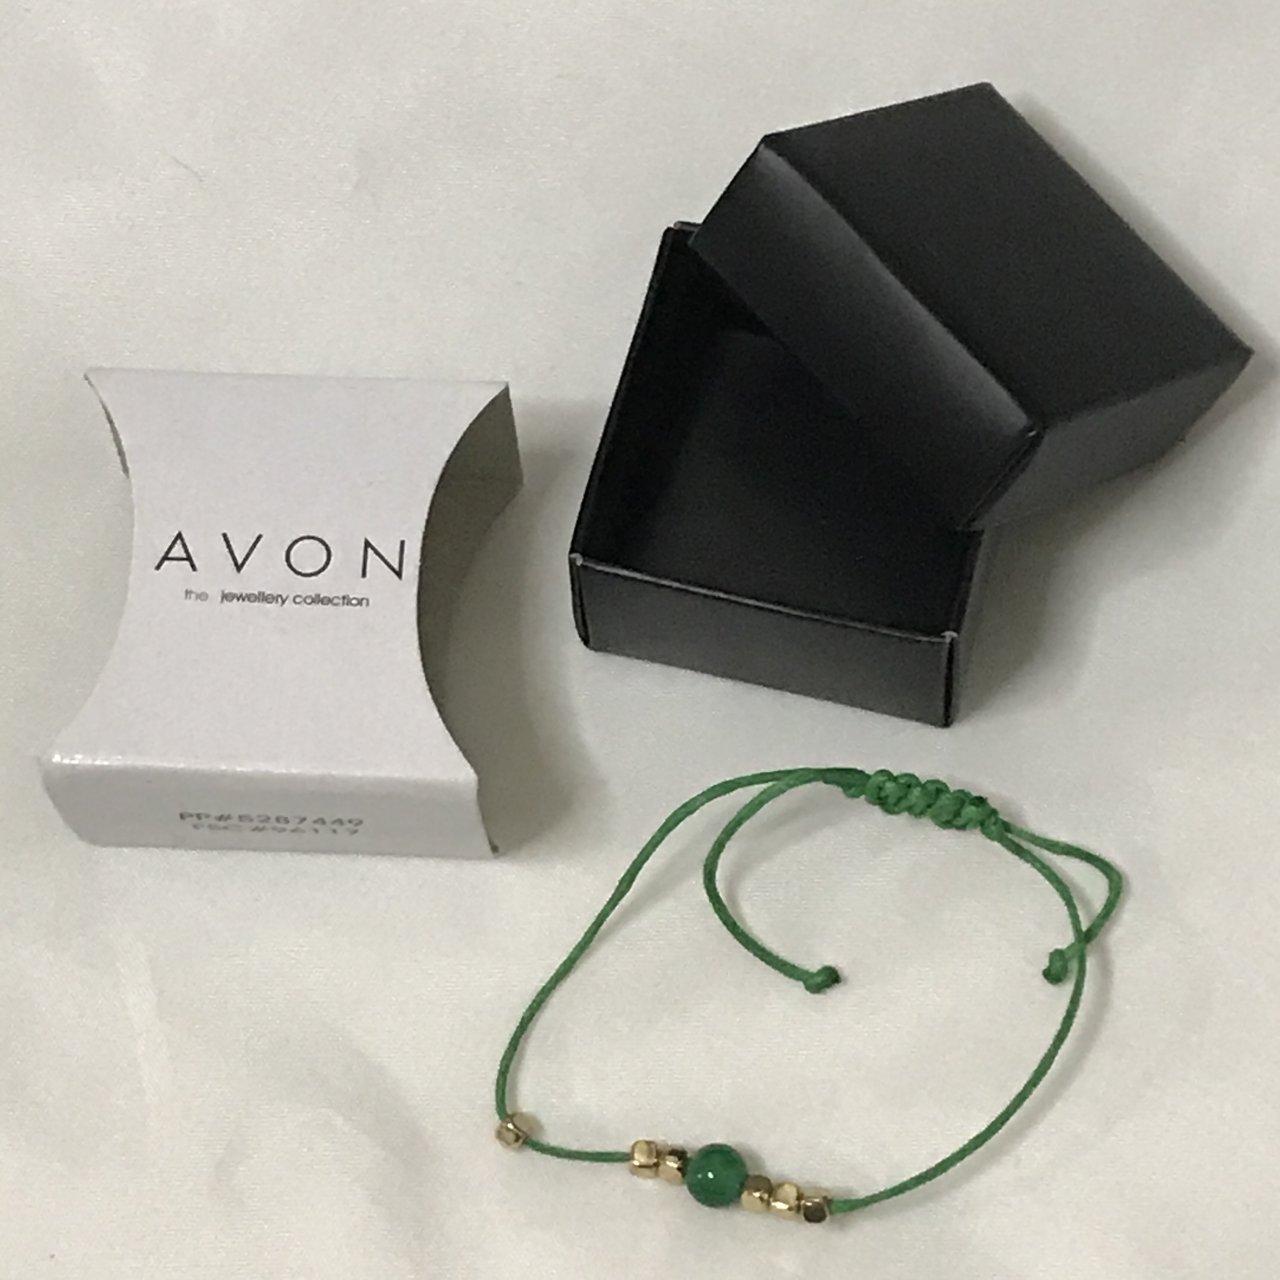 AVON Semi Precious Stone Cord Bracelet Green - Gift Boxed - NIB PP#5287449